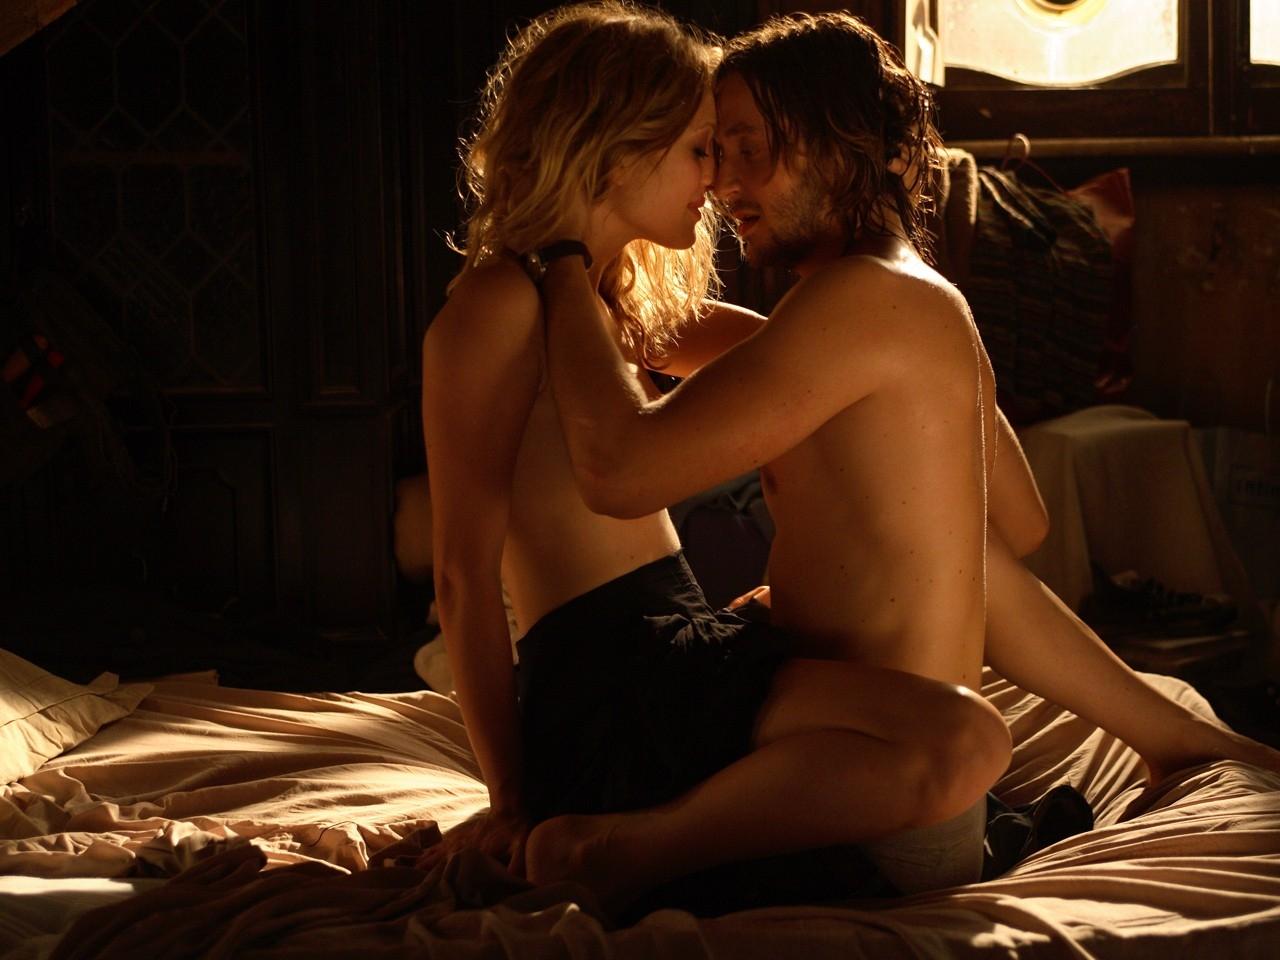 film sensuale ricerca incontri